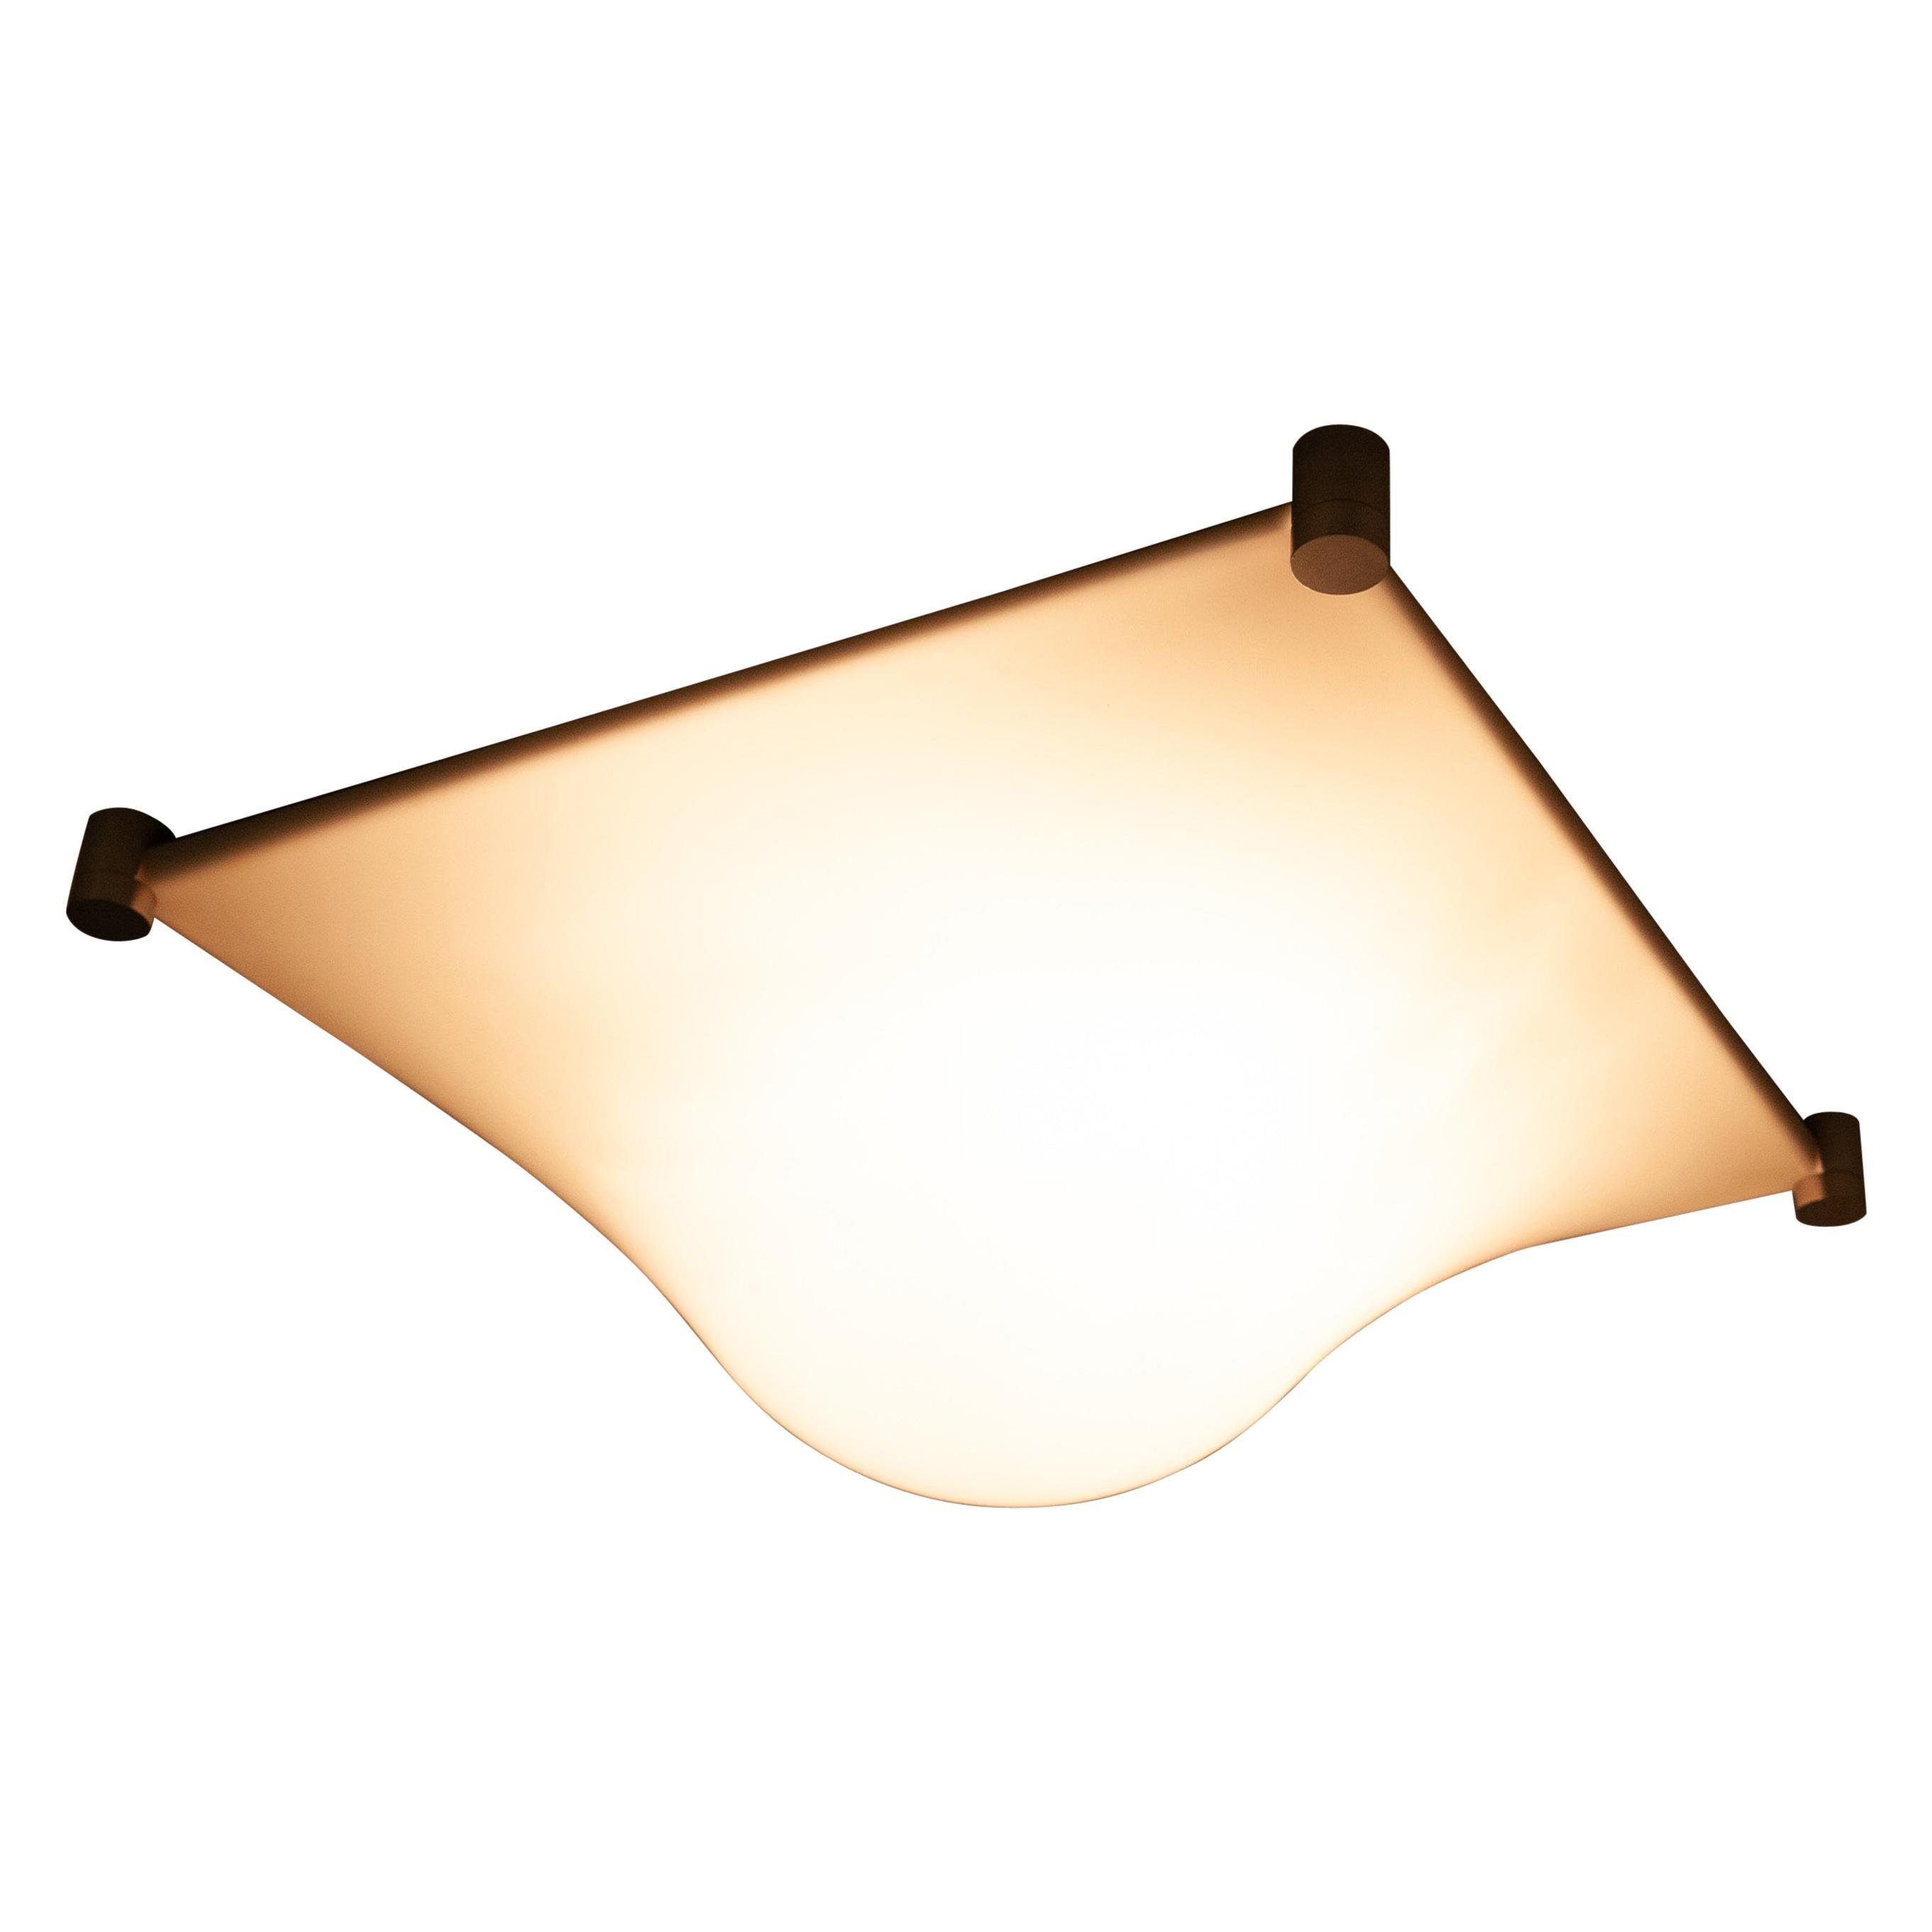 Elio Martinelli Bollo Ceiling or Wall Light